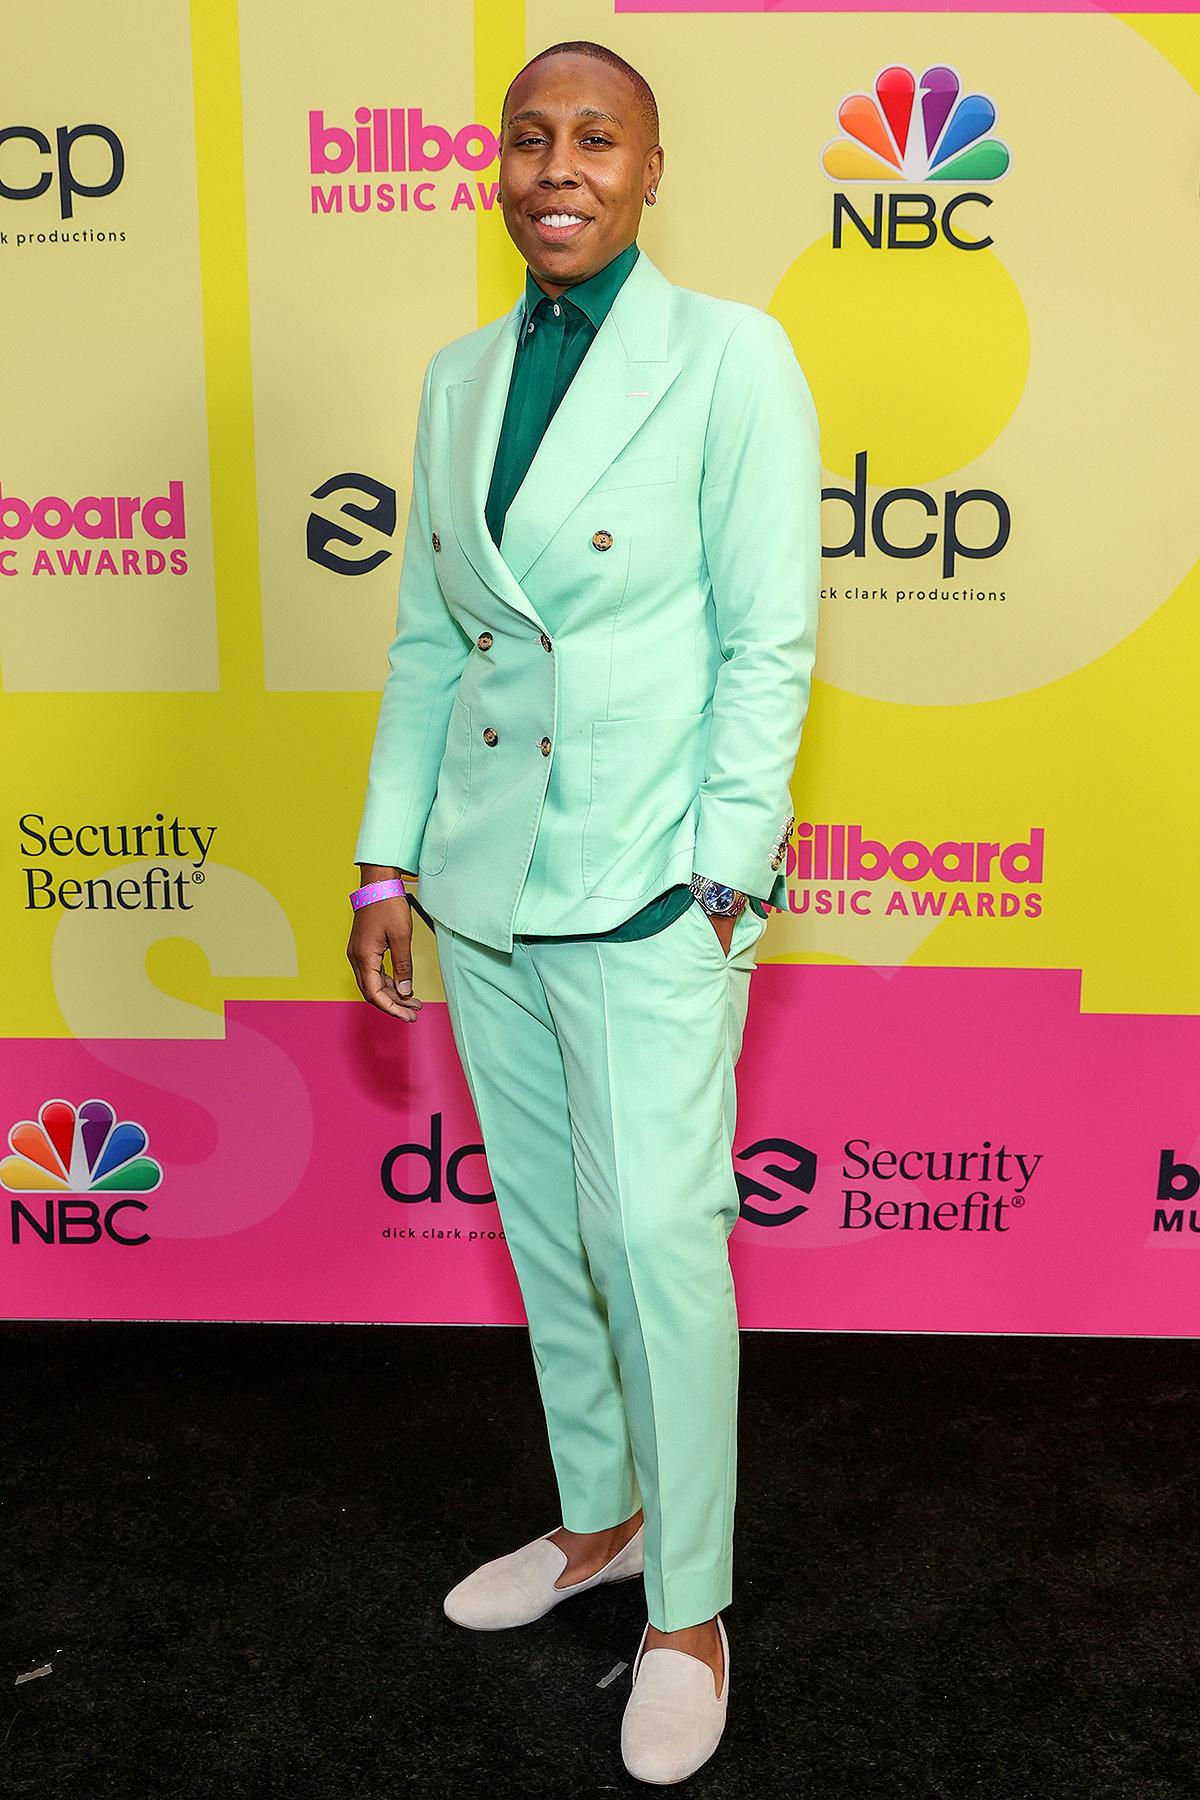 Lena Waithe poses backstage for the 2021 Billboard Music Awards